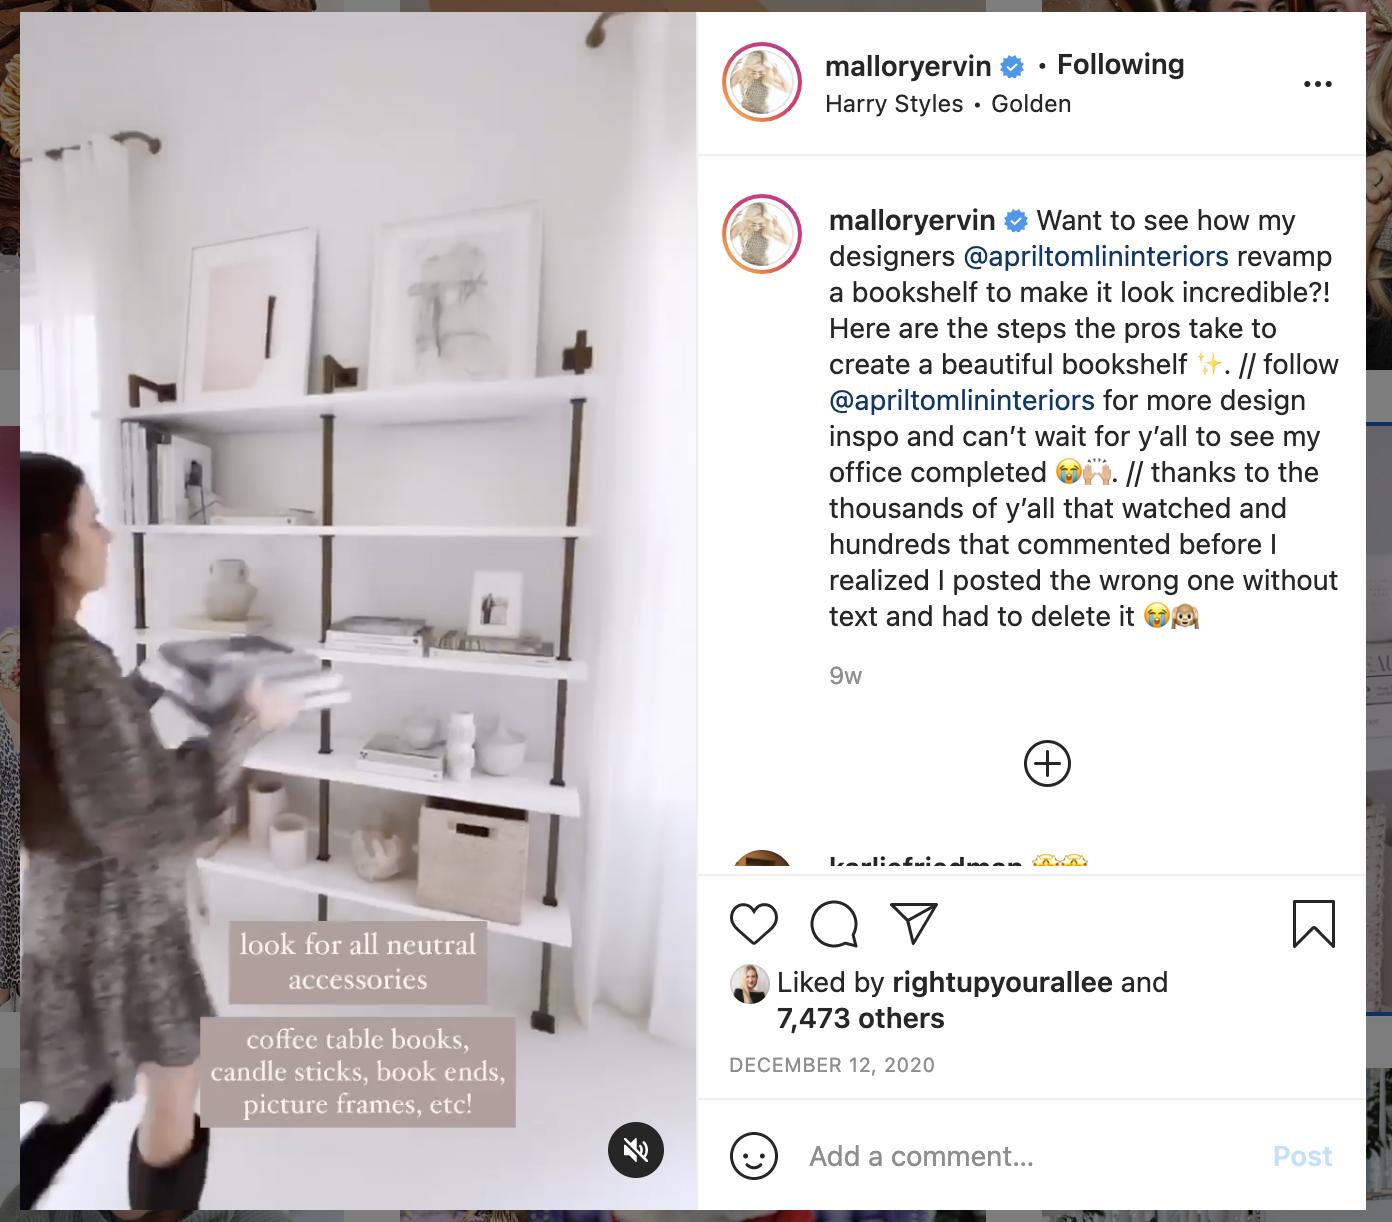 Instagram behind the scenes post